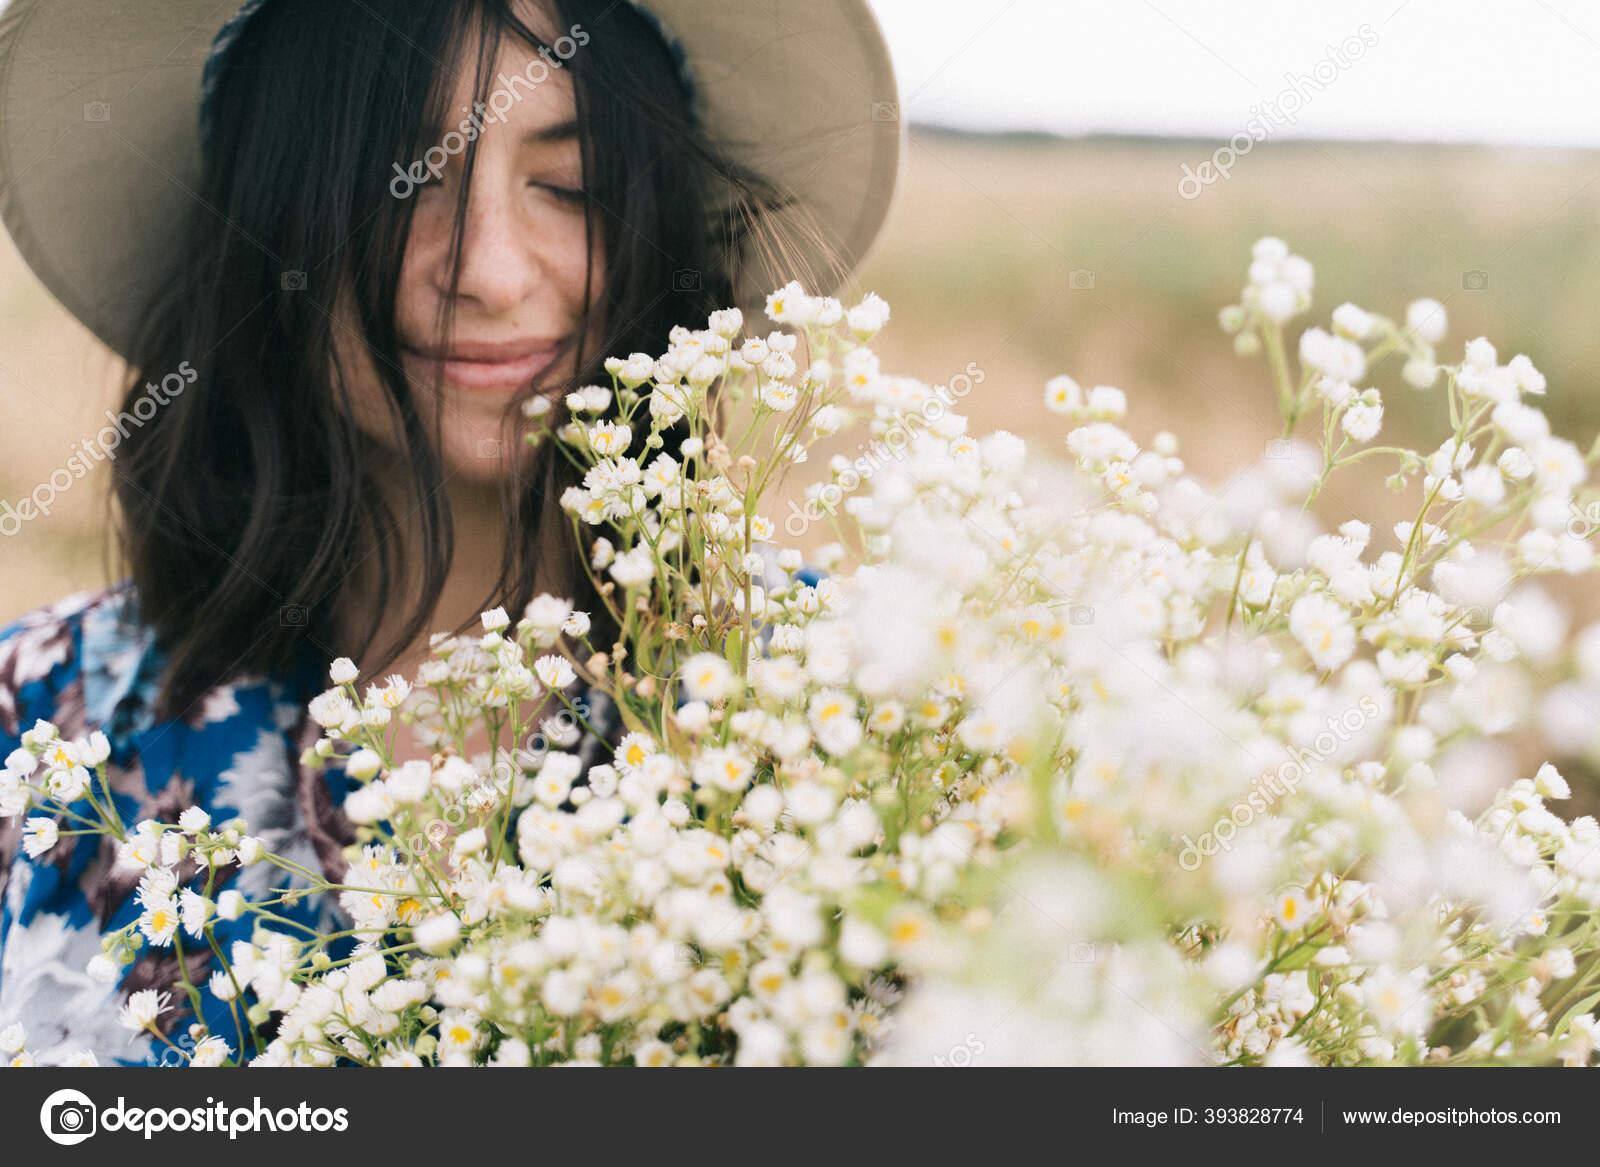 Potret Sensual Gadis Cantik Dengan Bunga Aster Besar Ladang Berangin Stok Foto C Sonyachny 393828774